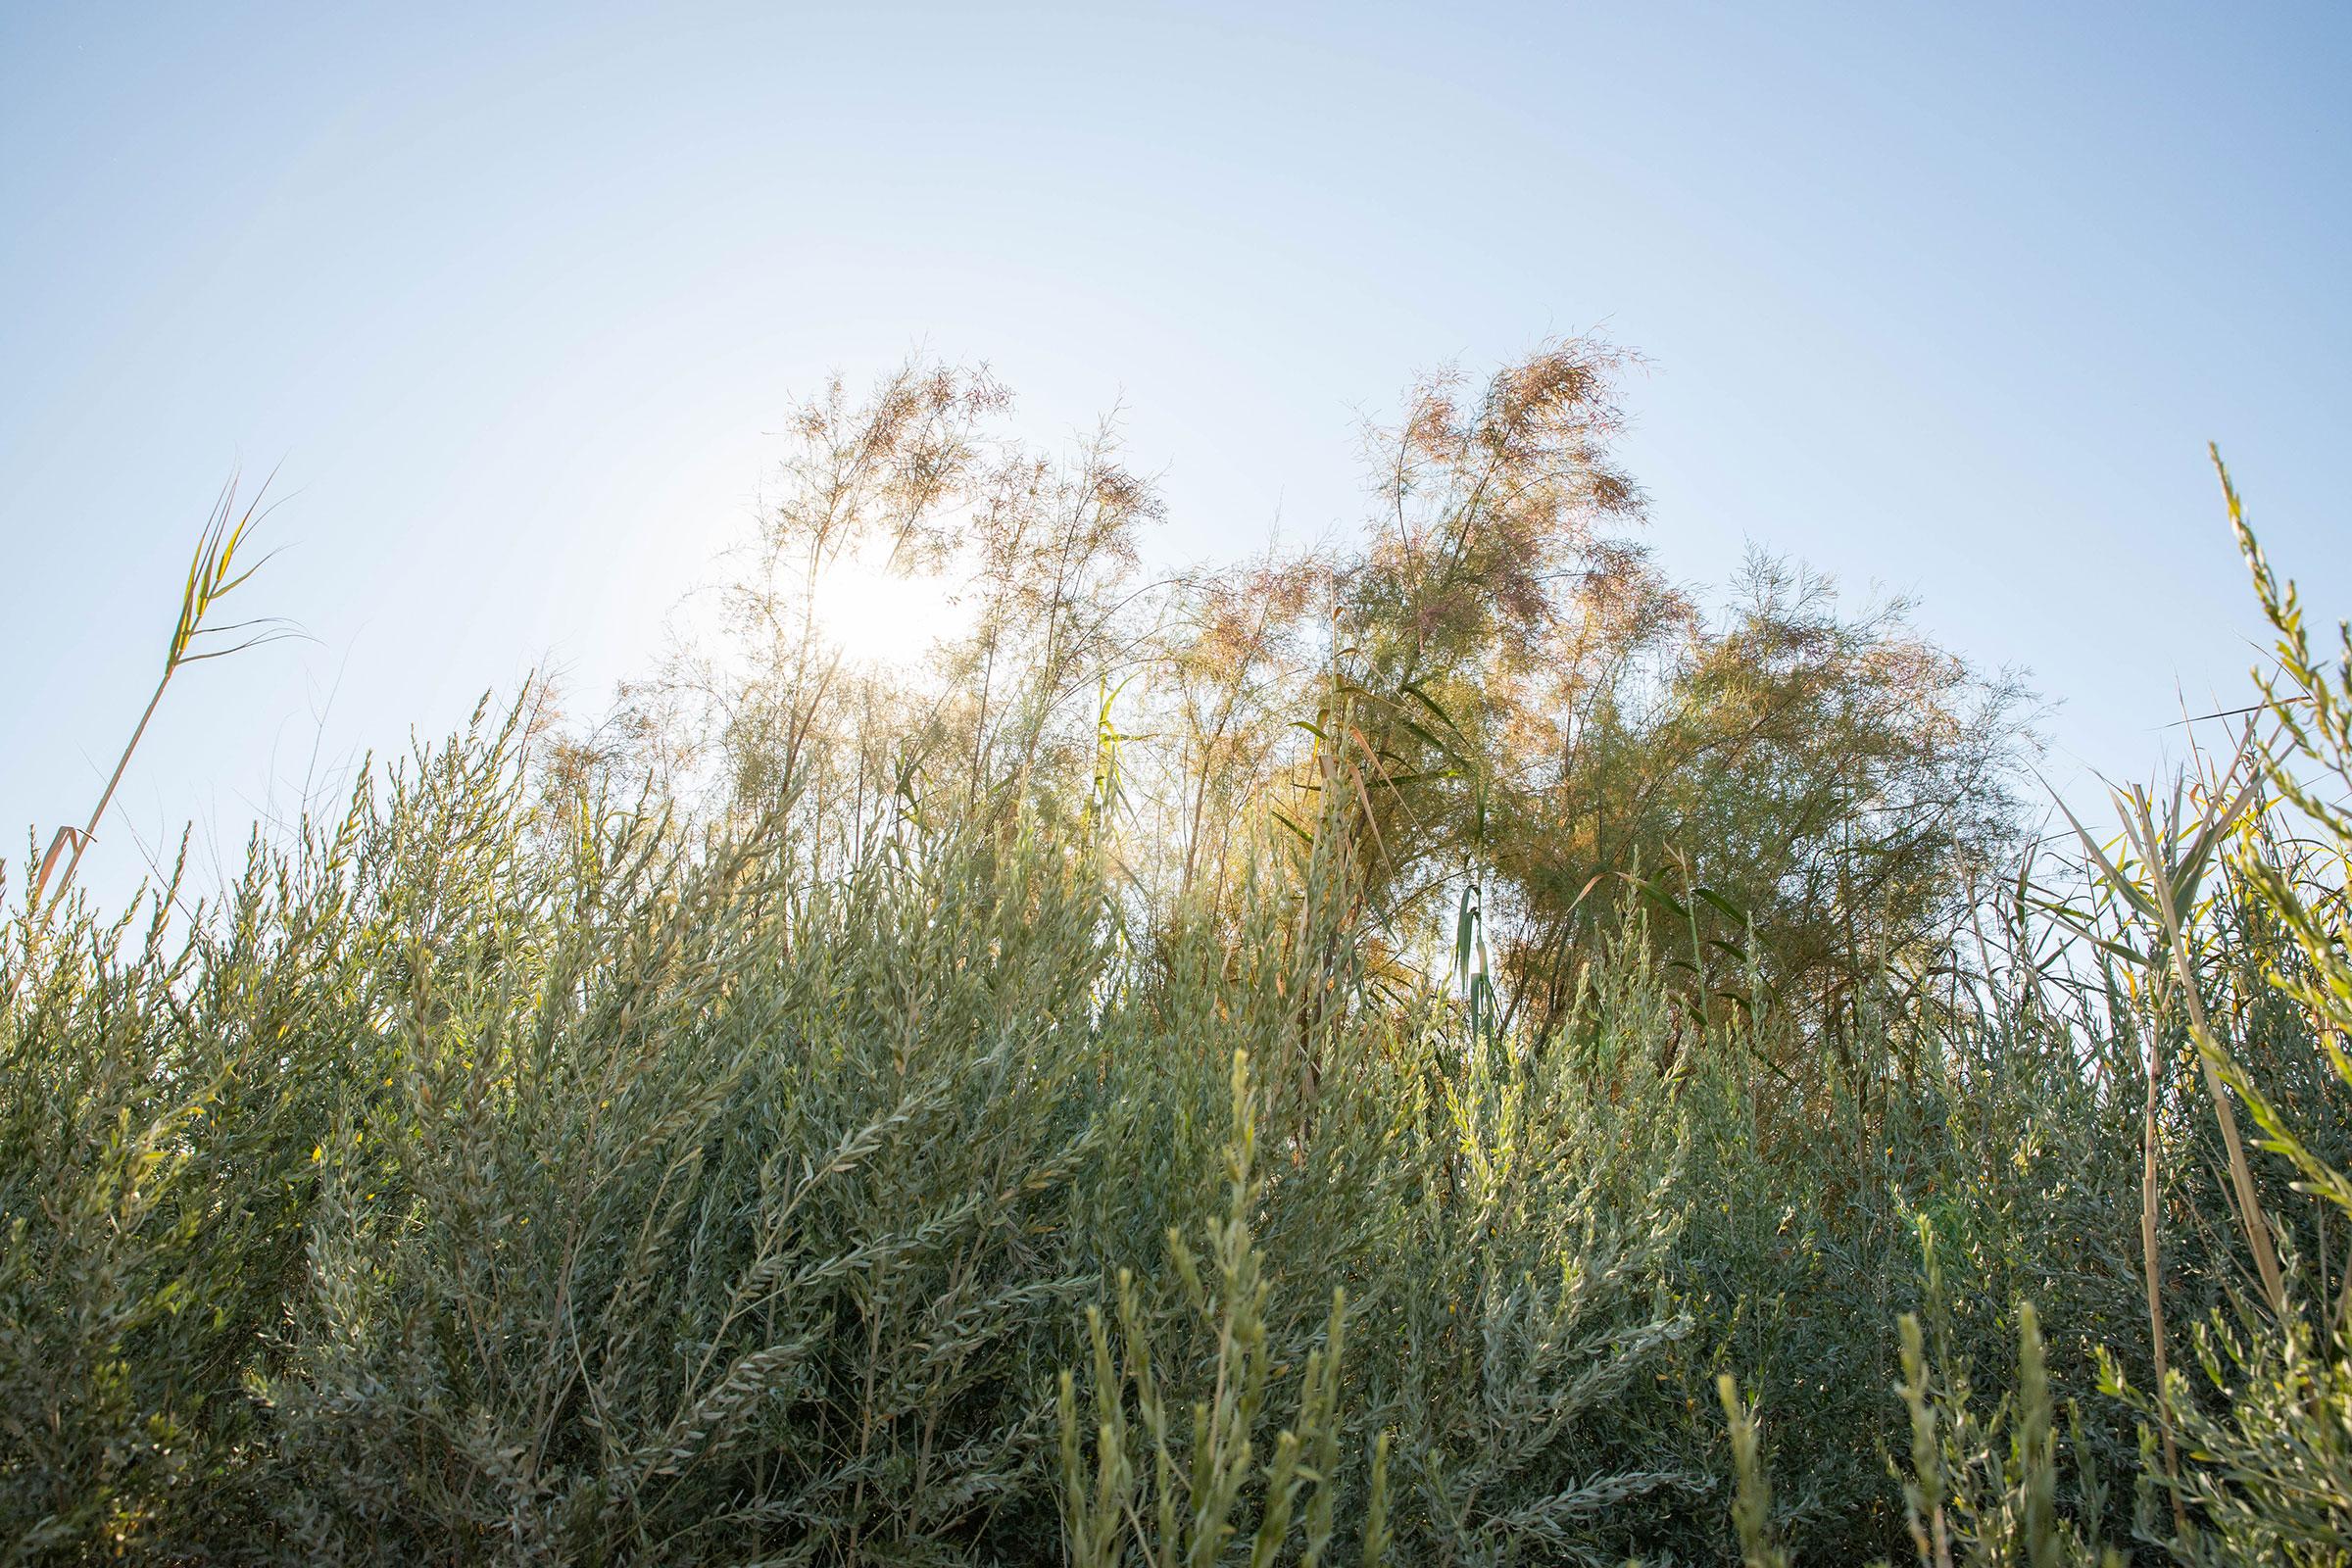 A non-native saltcedar tree in the Yuma East Wetlands that the Yuma Crossing National Heritage Area team plans to clear. Yuma, Arizona. Dominic Arenas/Audubon